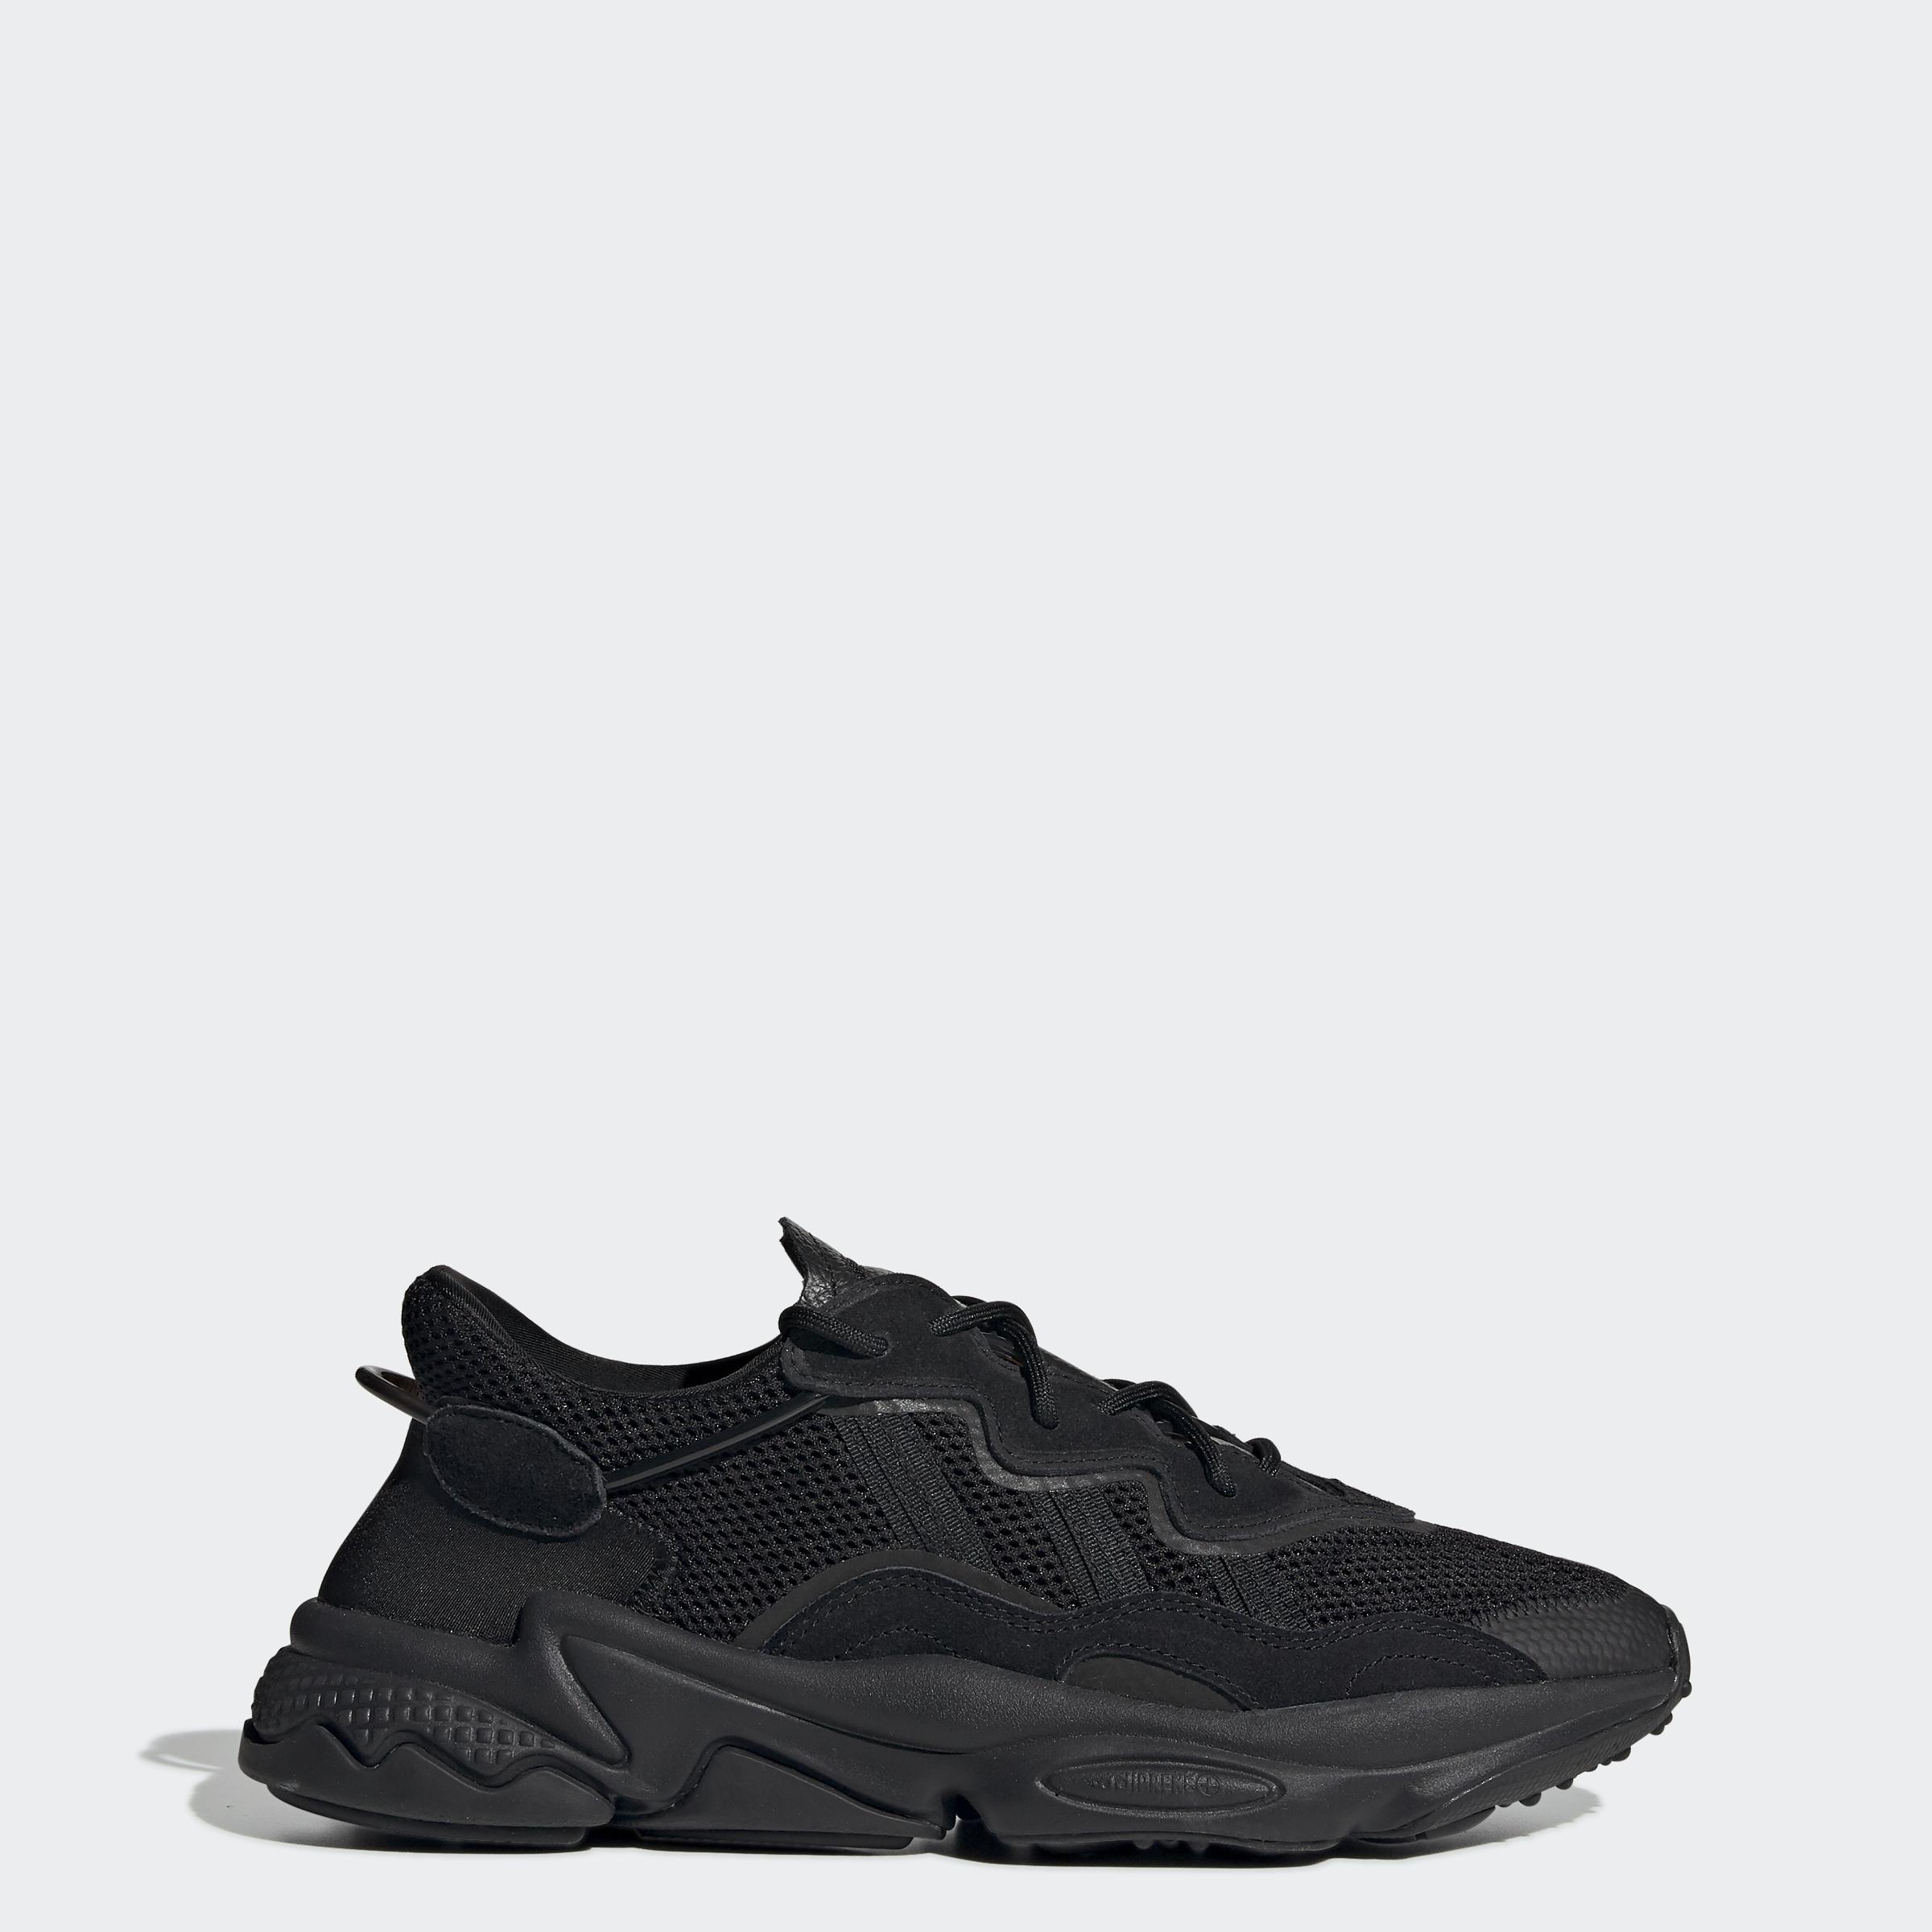 adidas-Originals-OZWEEGO-Shoes-Men-039-s thumbnail 37